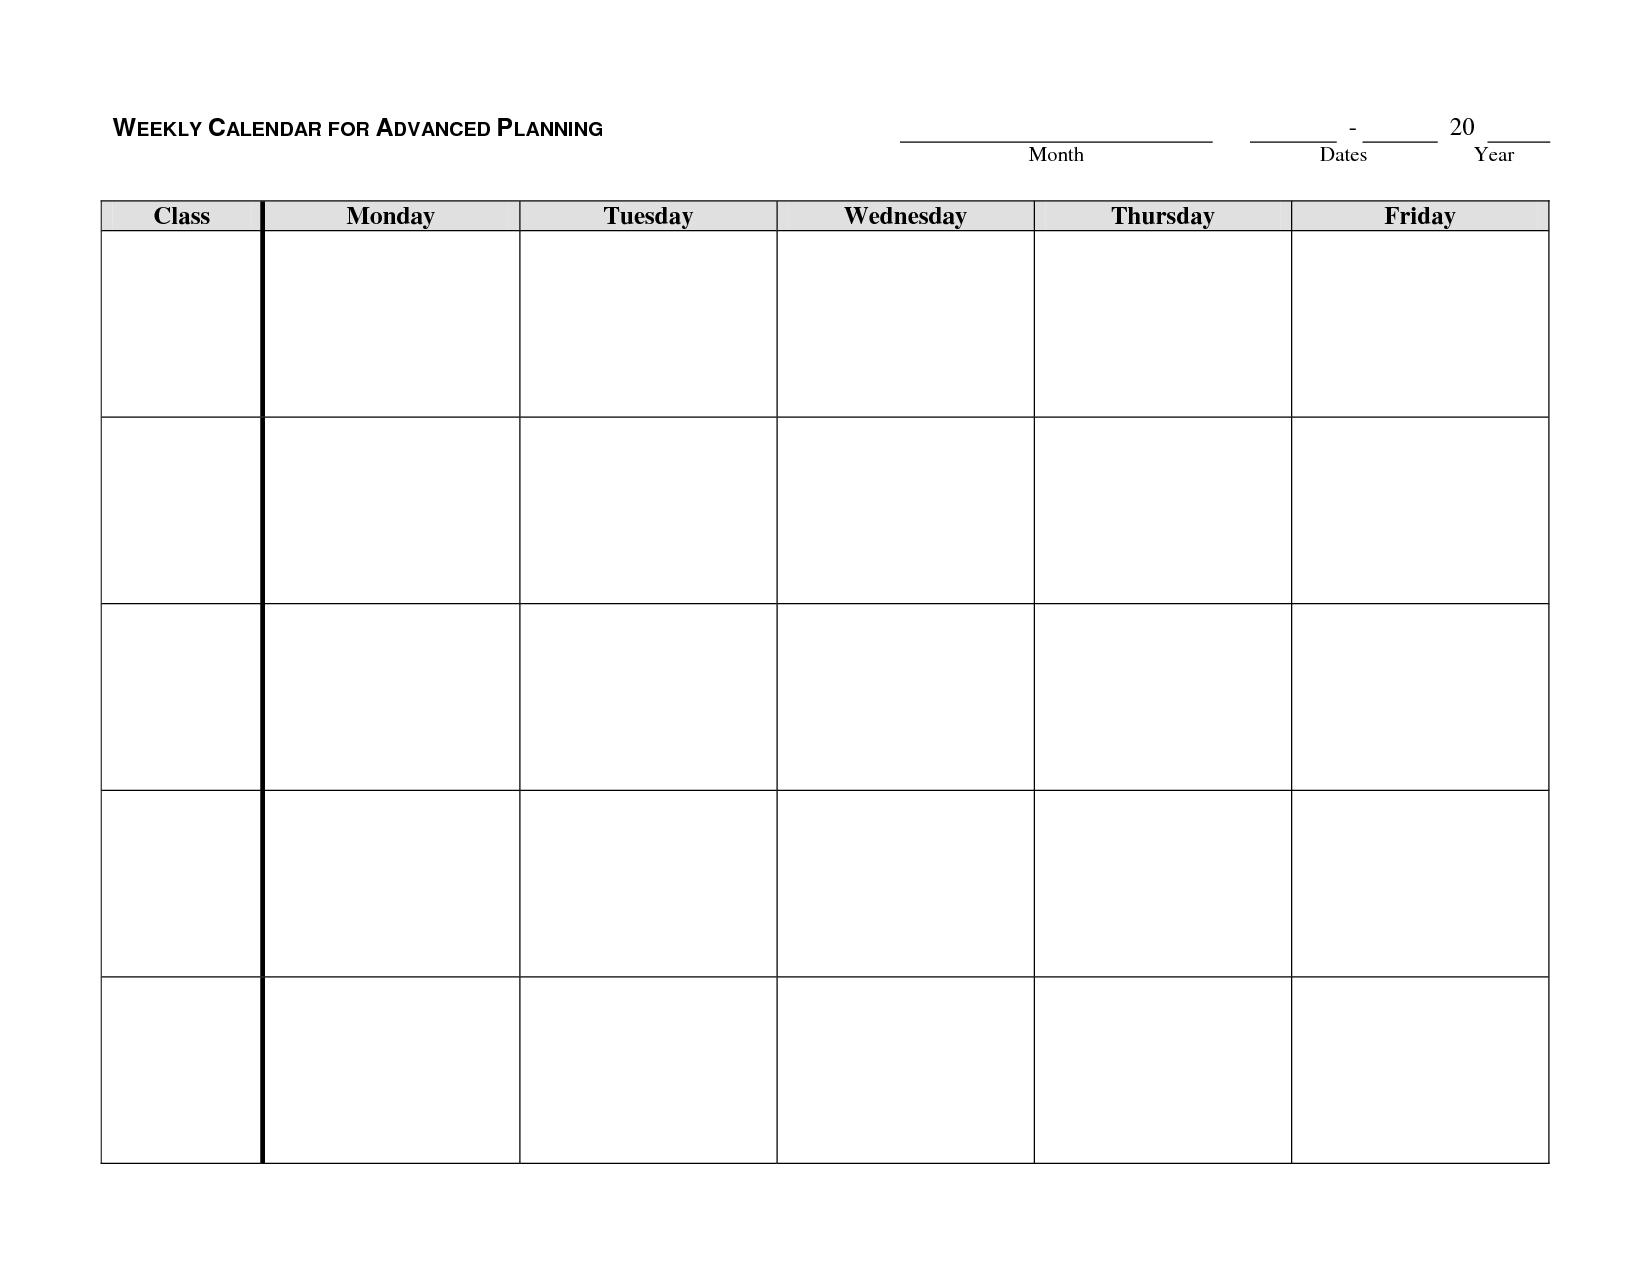 Pin On Weekly Calendar inside Monday Thru Friday Schedule Template